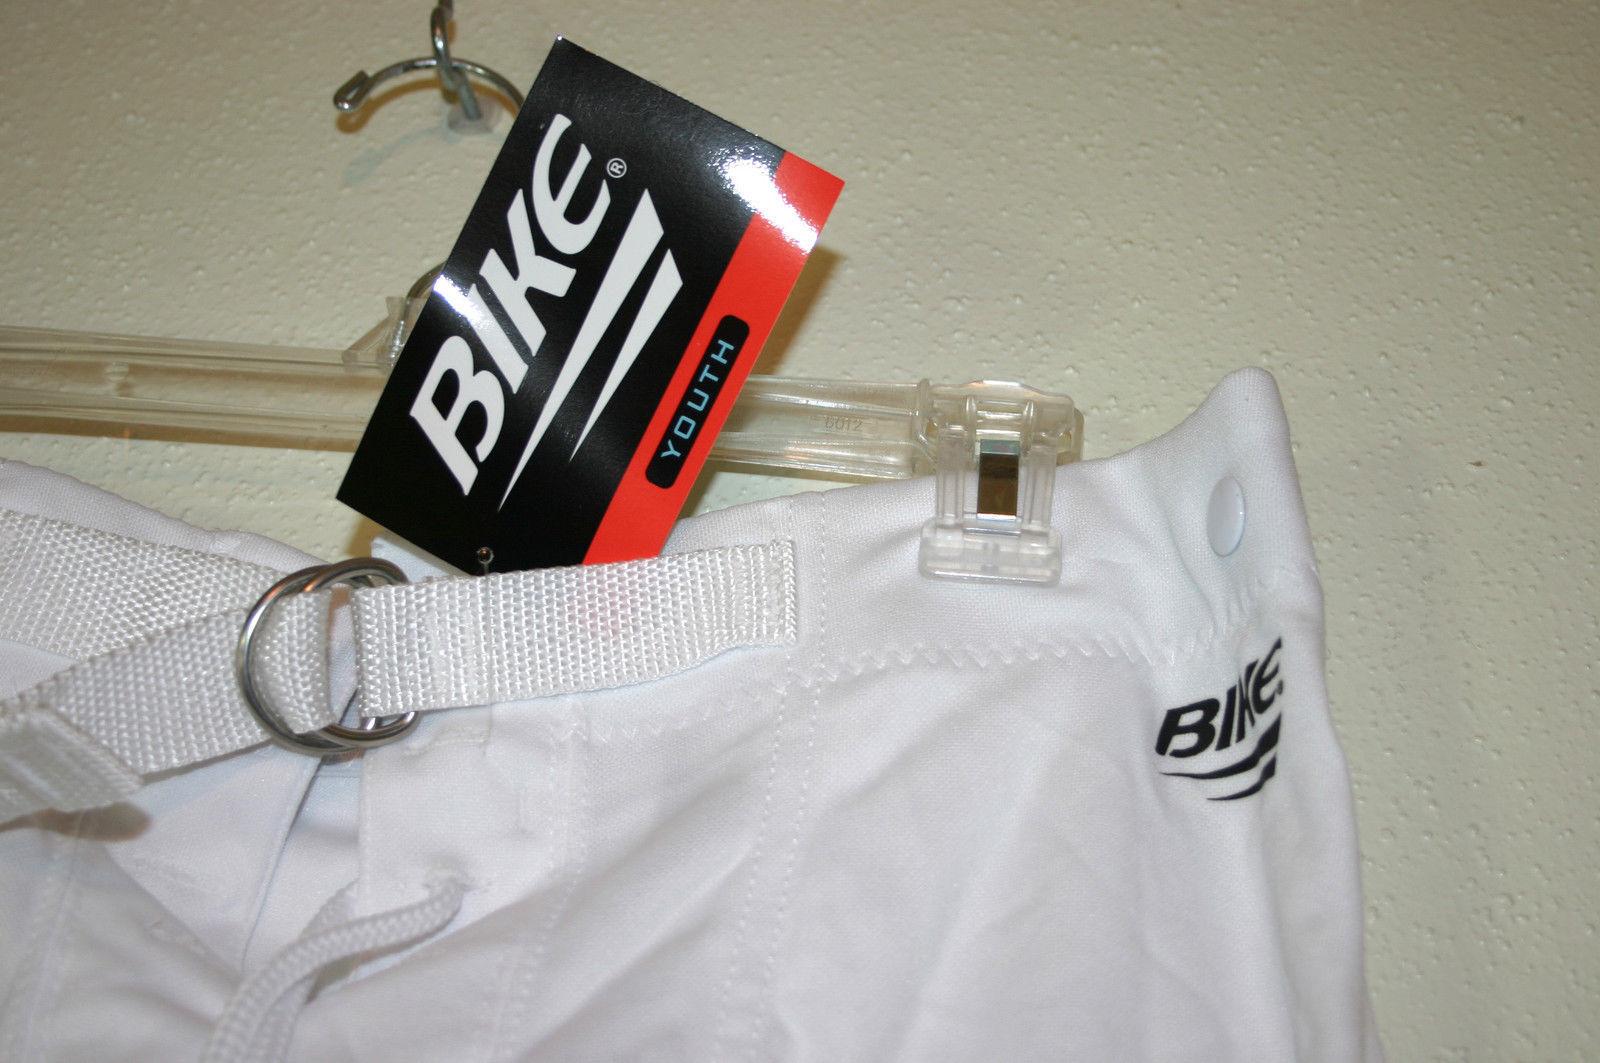 New BIKE Brand Boys Youth Size XL White Football Practice Pants